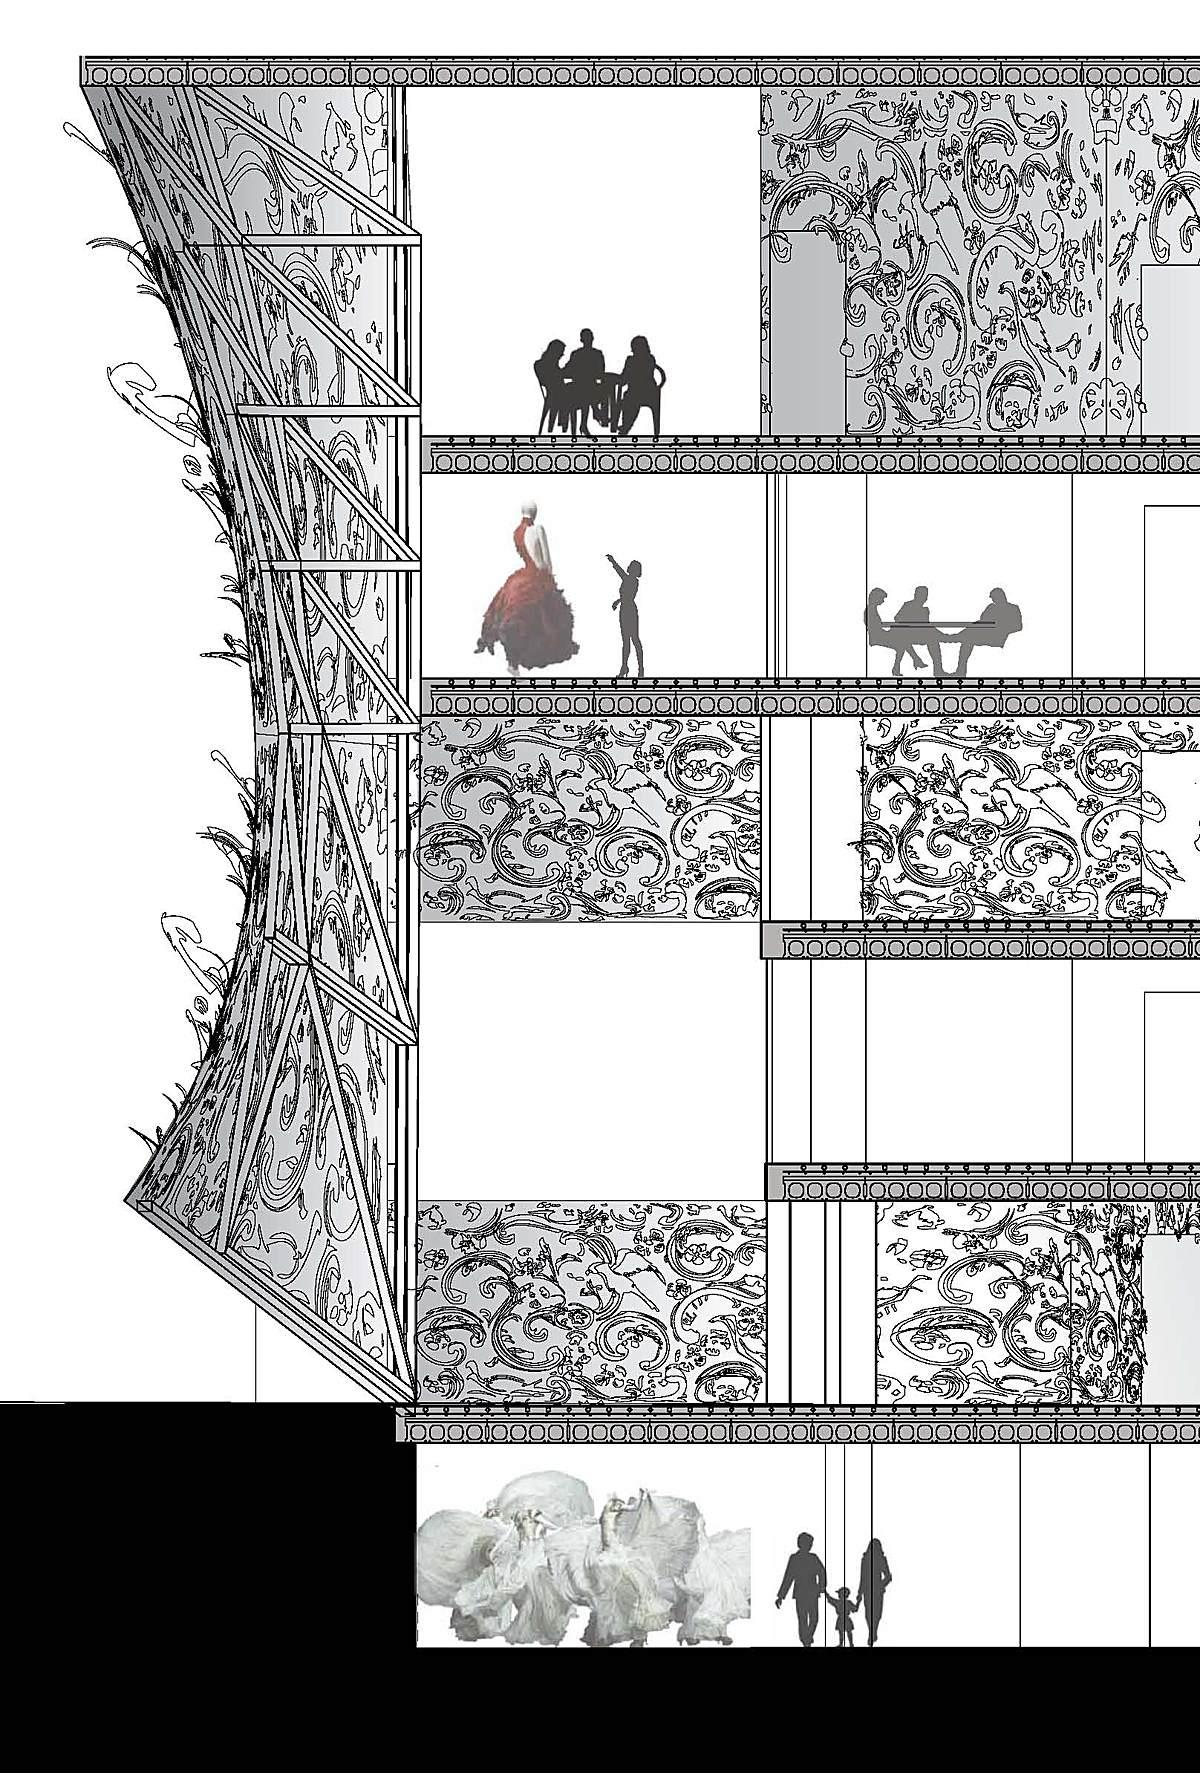 Sgambati_Alexander McQueen studio h.q._facade wall detailed section_drawing